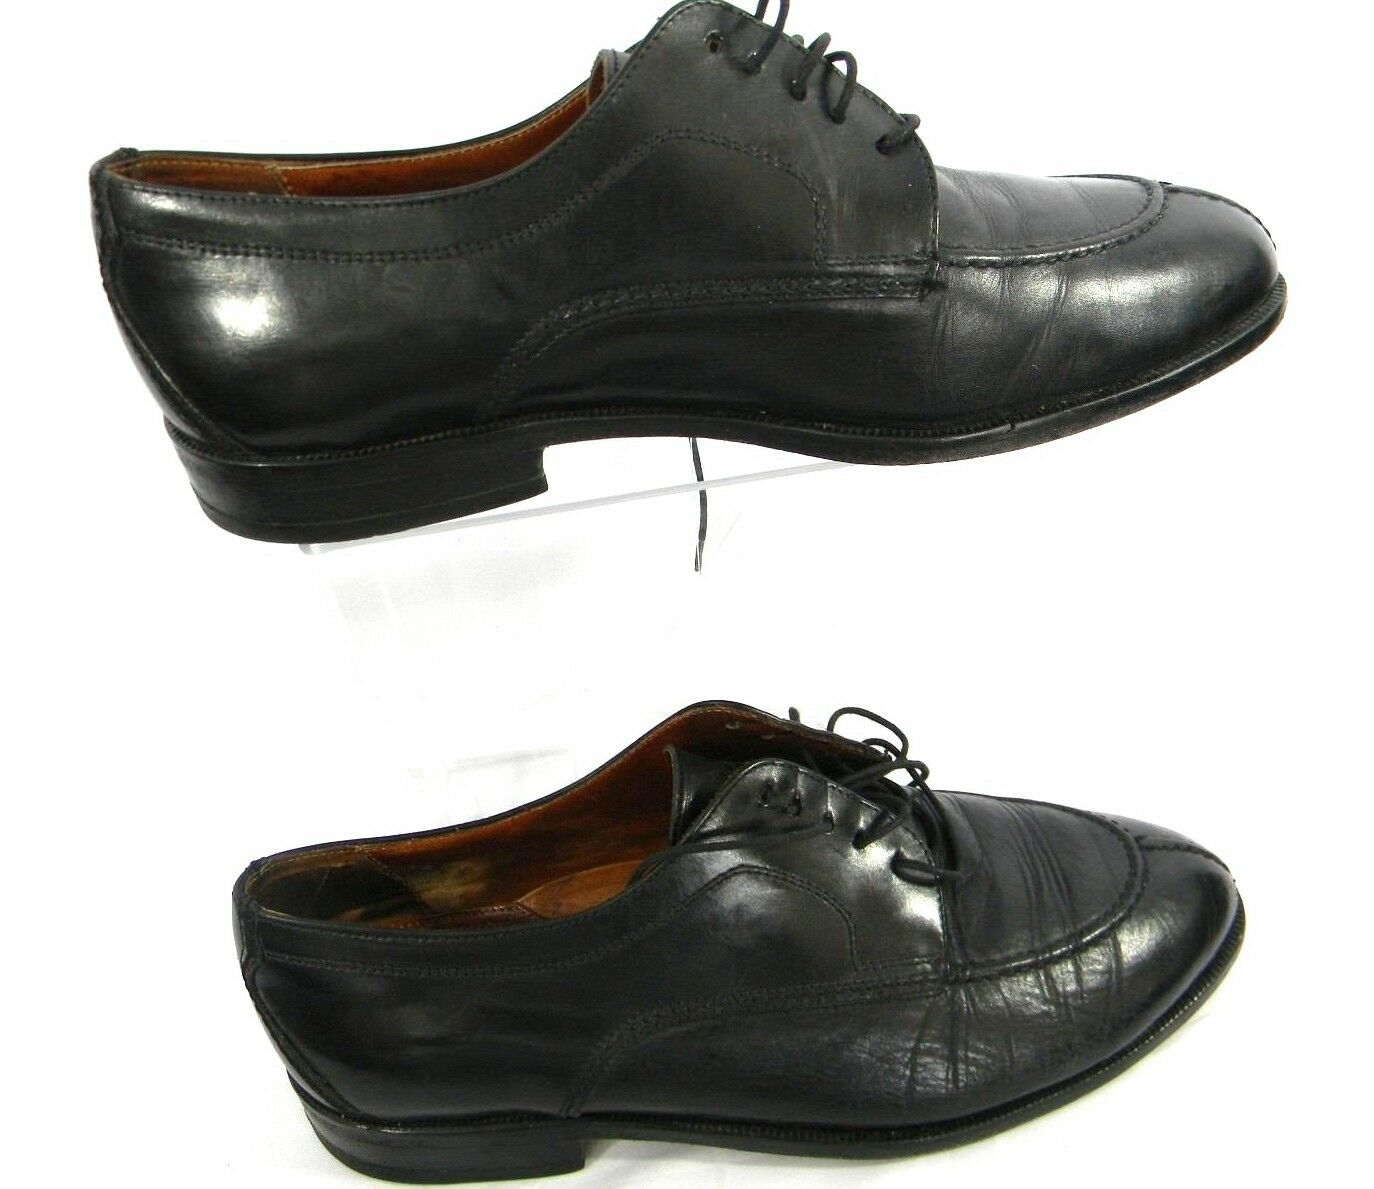 Bostonian Florentine 10.5 W  Mens shoes Black Leather Oxford Lace-Up Dress shoes